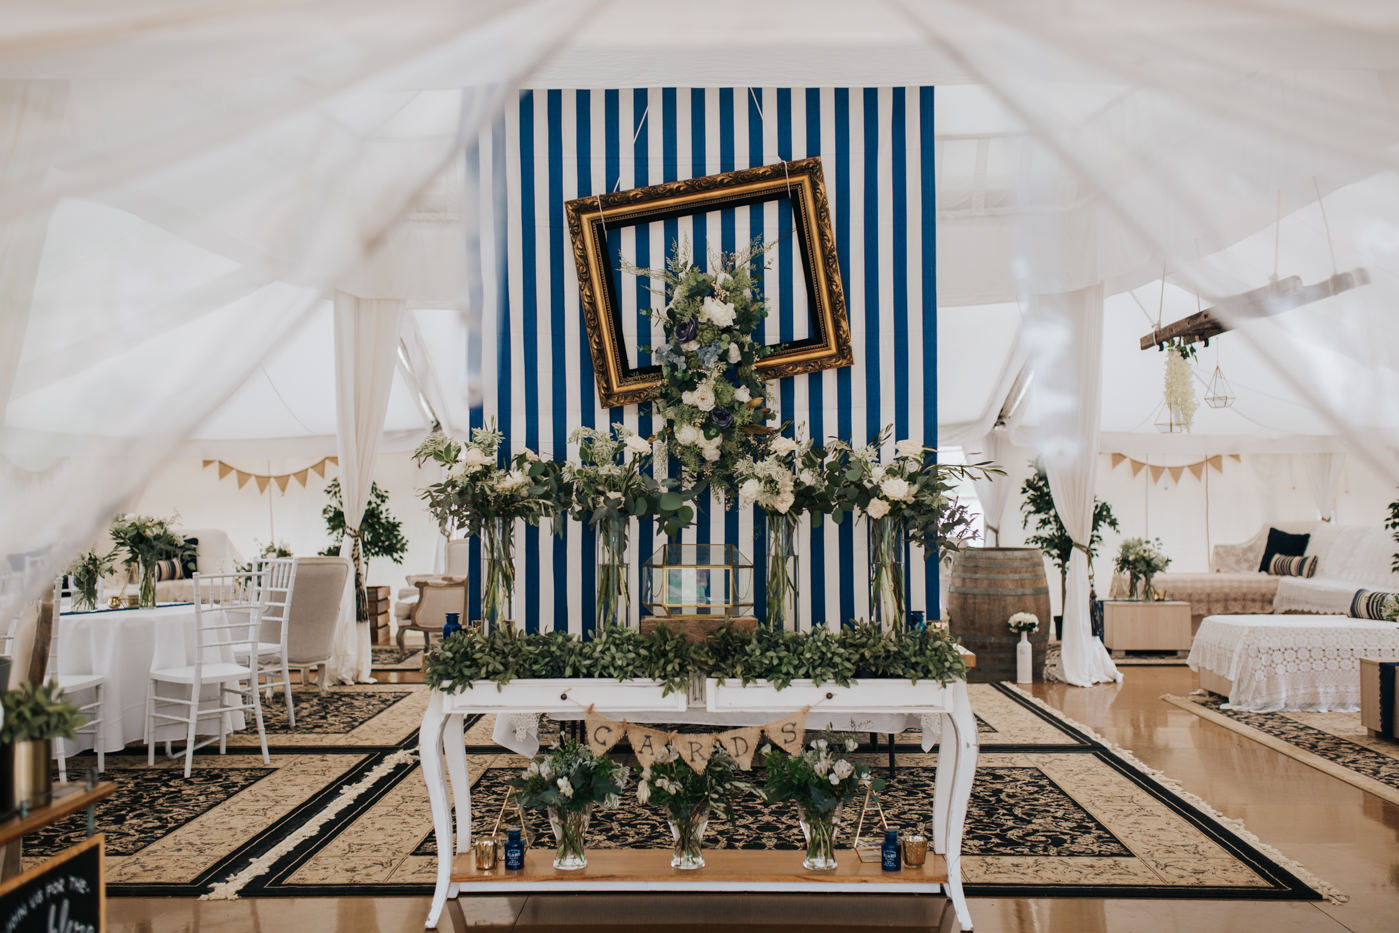 Nick & Vanezza - Fernbank Farm Wedding - Samantha Heather Photography-47.jpg